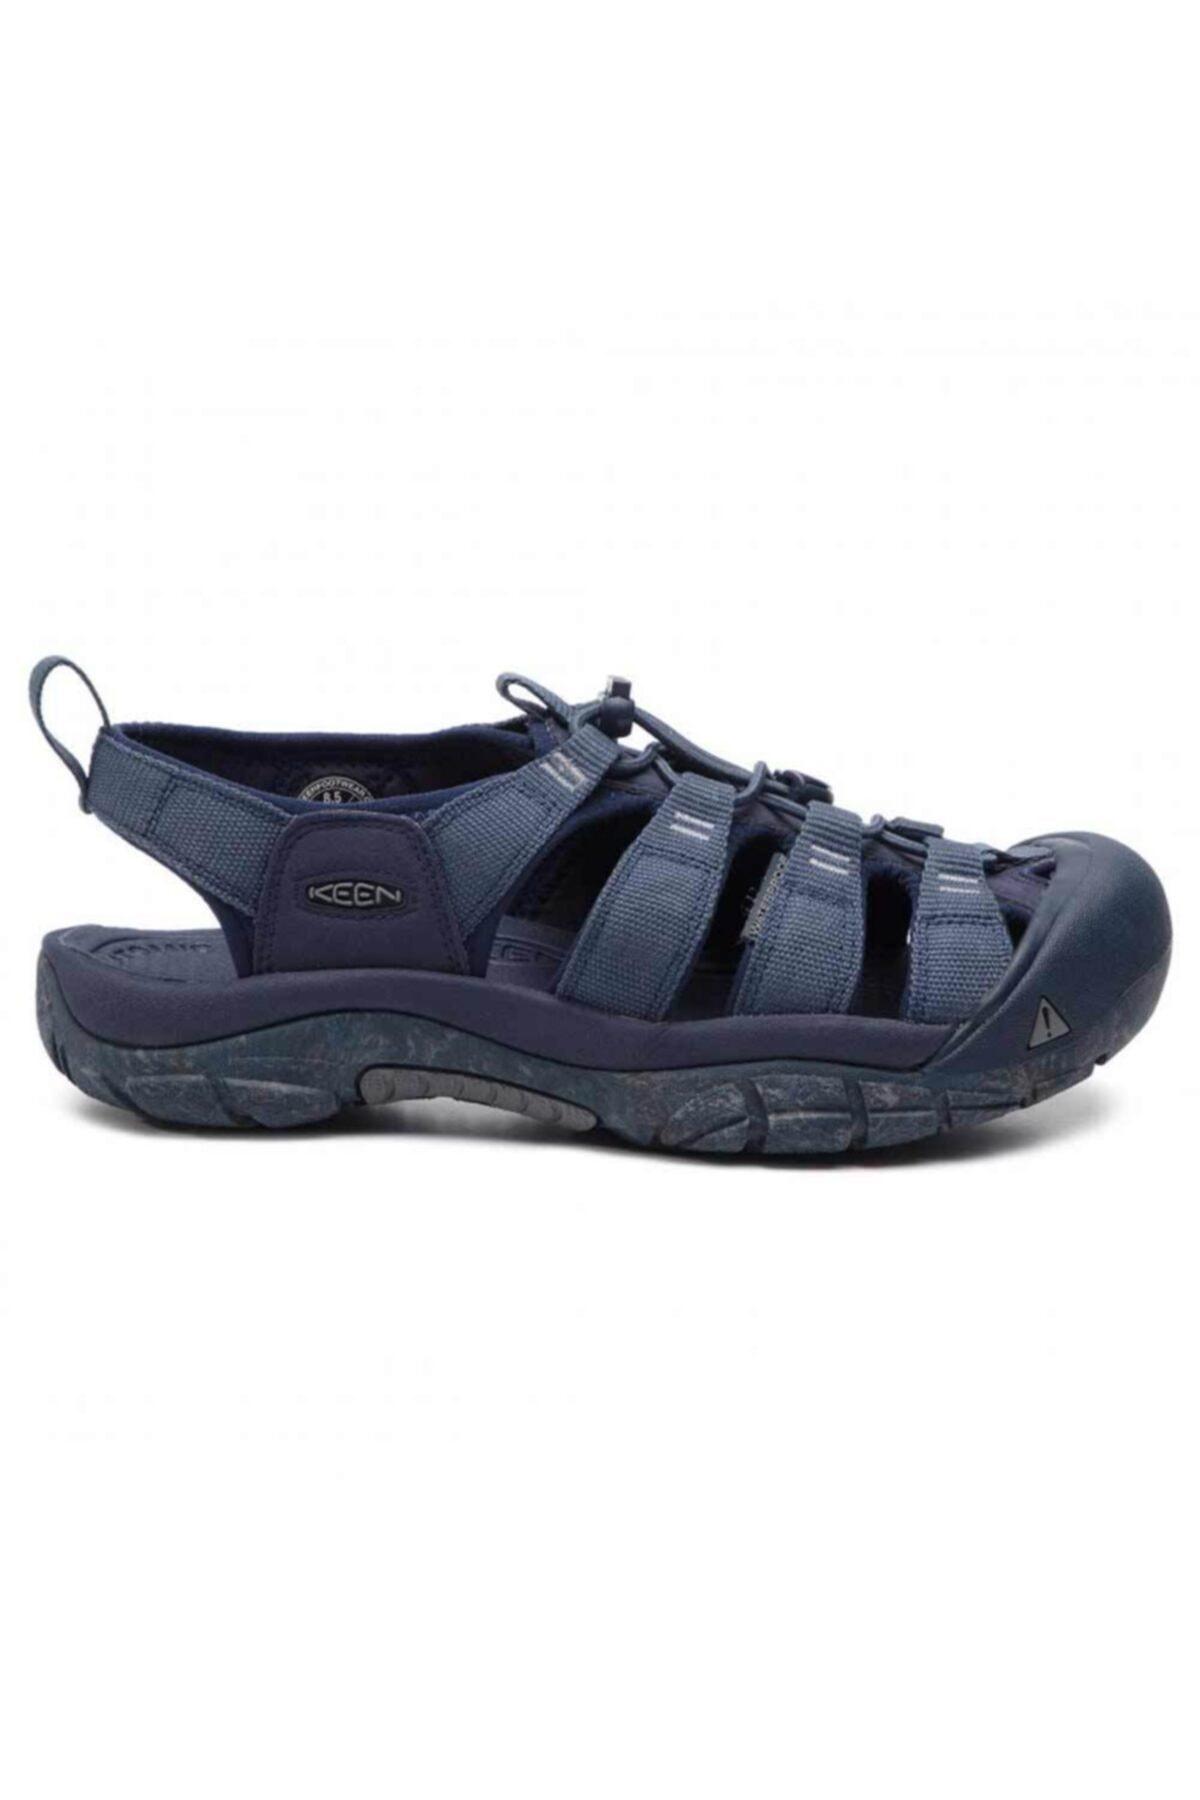 Keen Newport H2 Erkek Sandalet 2